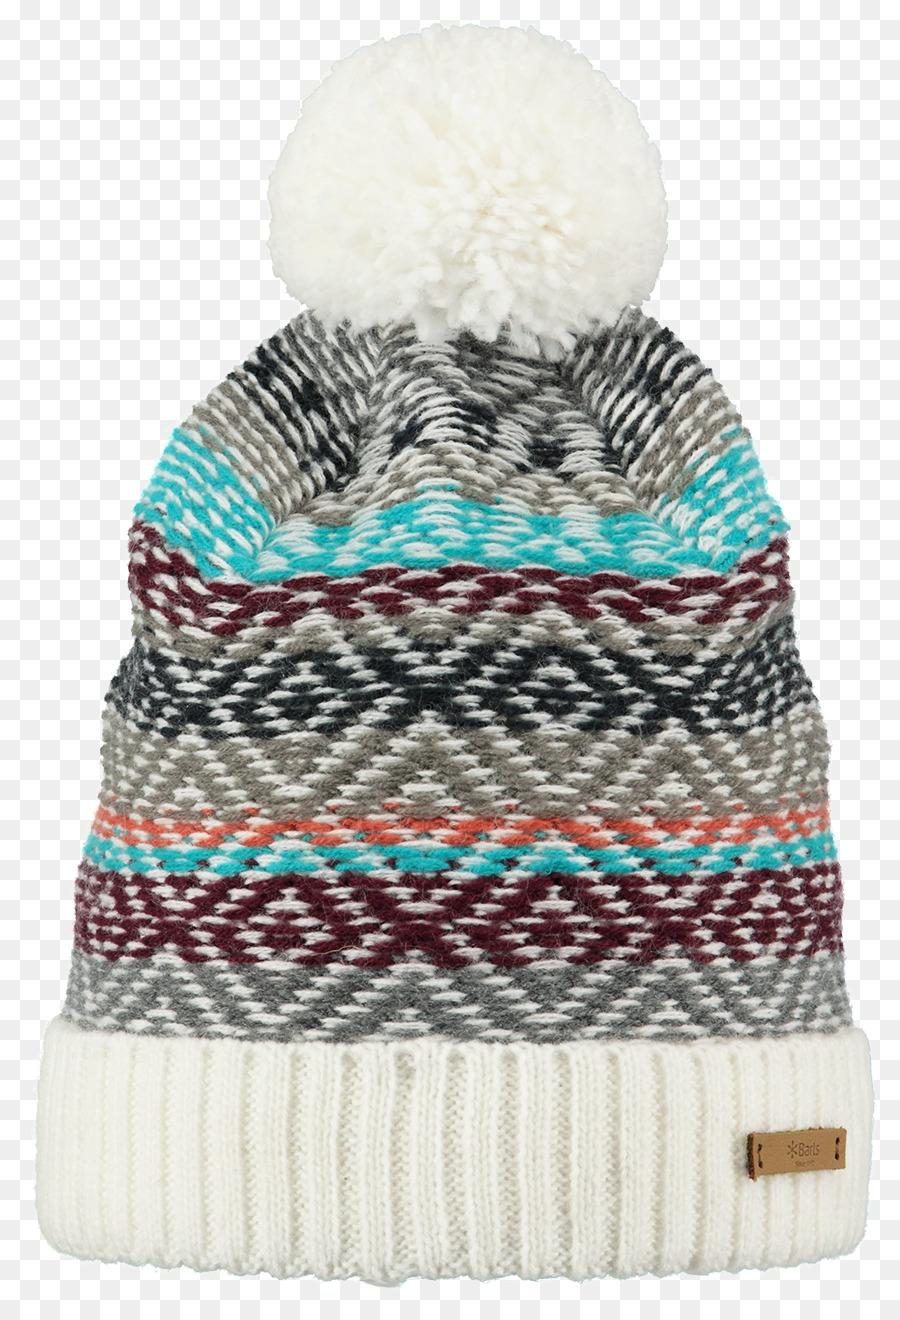 df4047dc8d25d Barts Halny Beanie Knit cap Barts Women s Feather Beanie - beanie ...